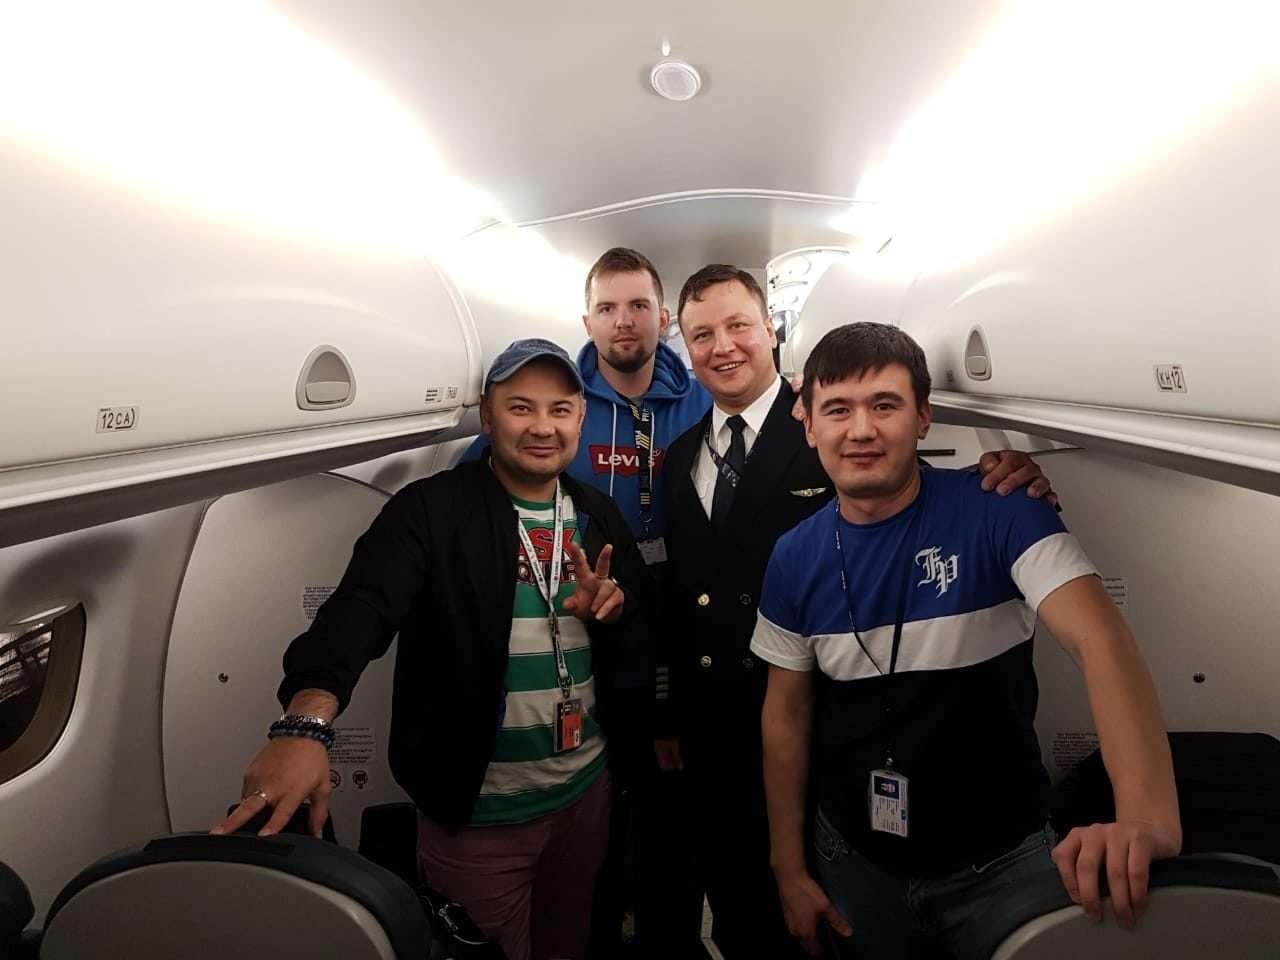 Снимок из салона самолёта сразу после приземления в Португалии